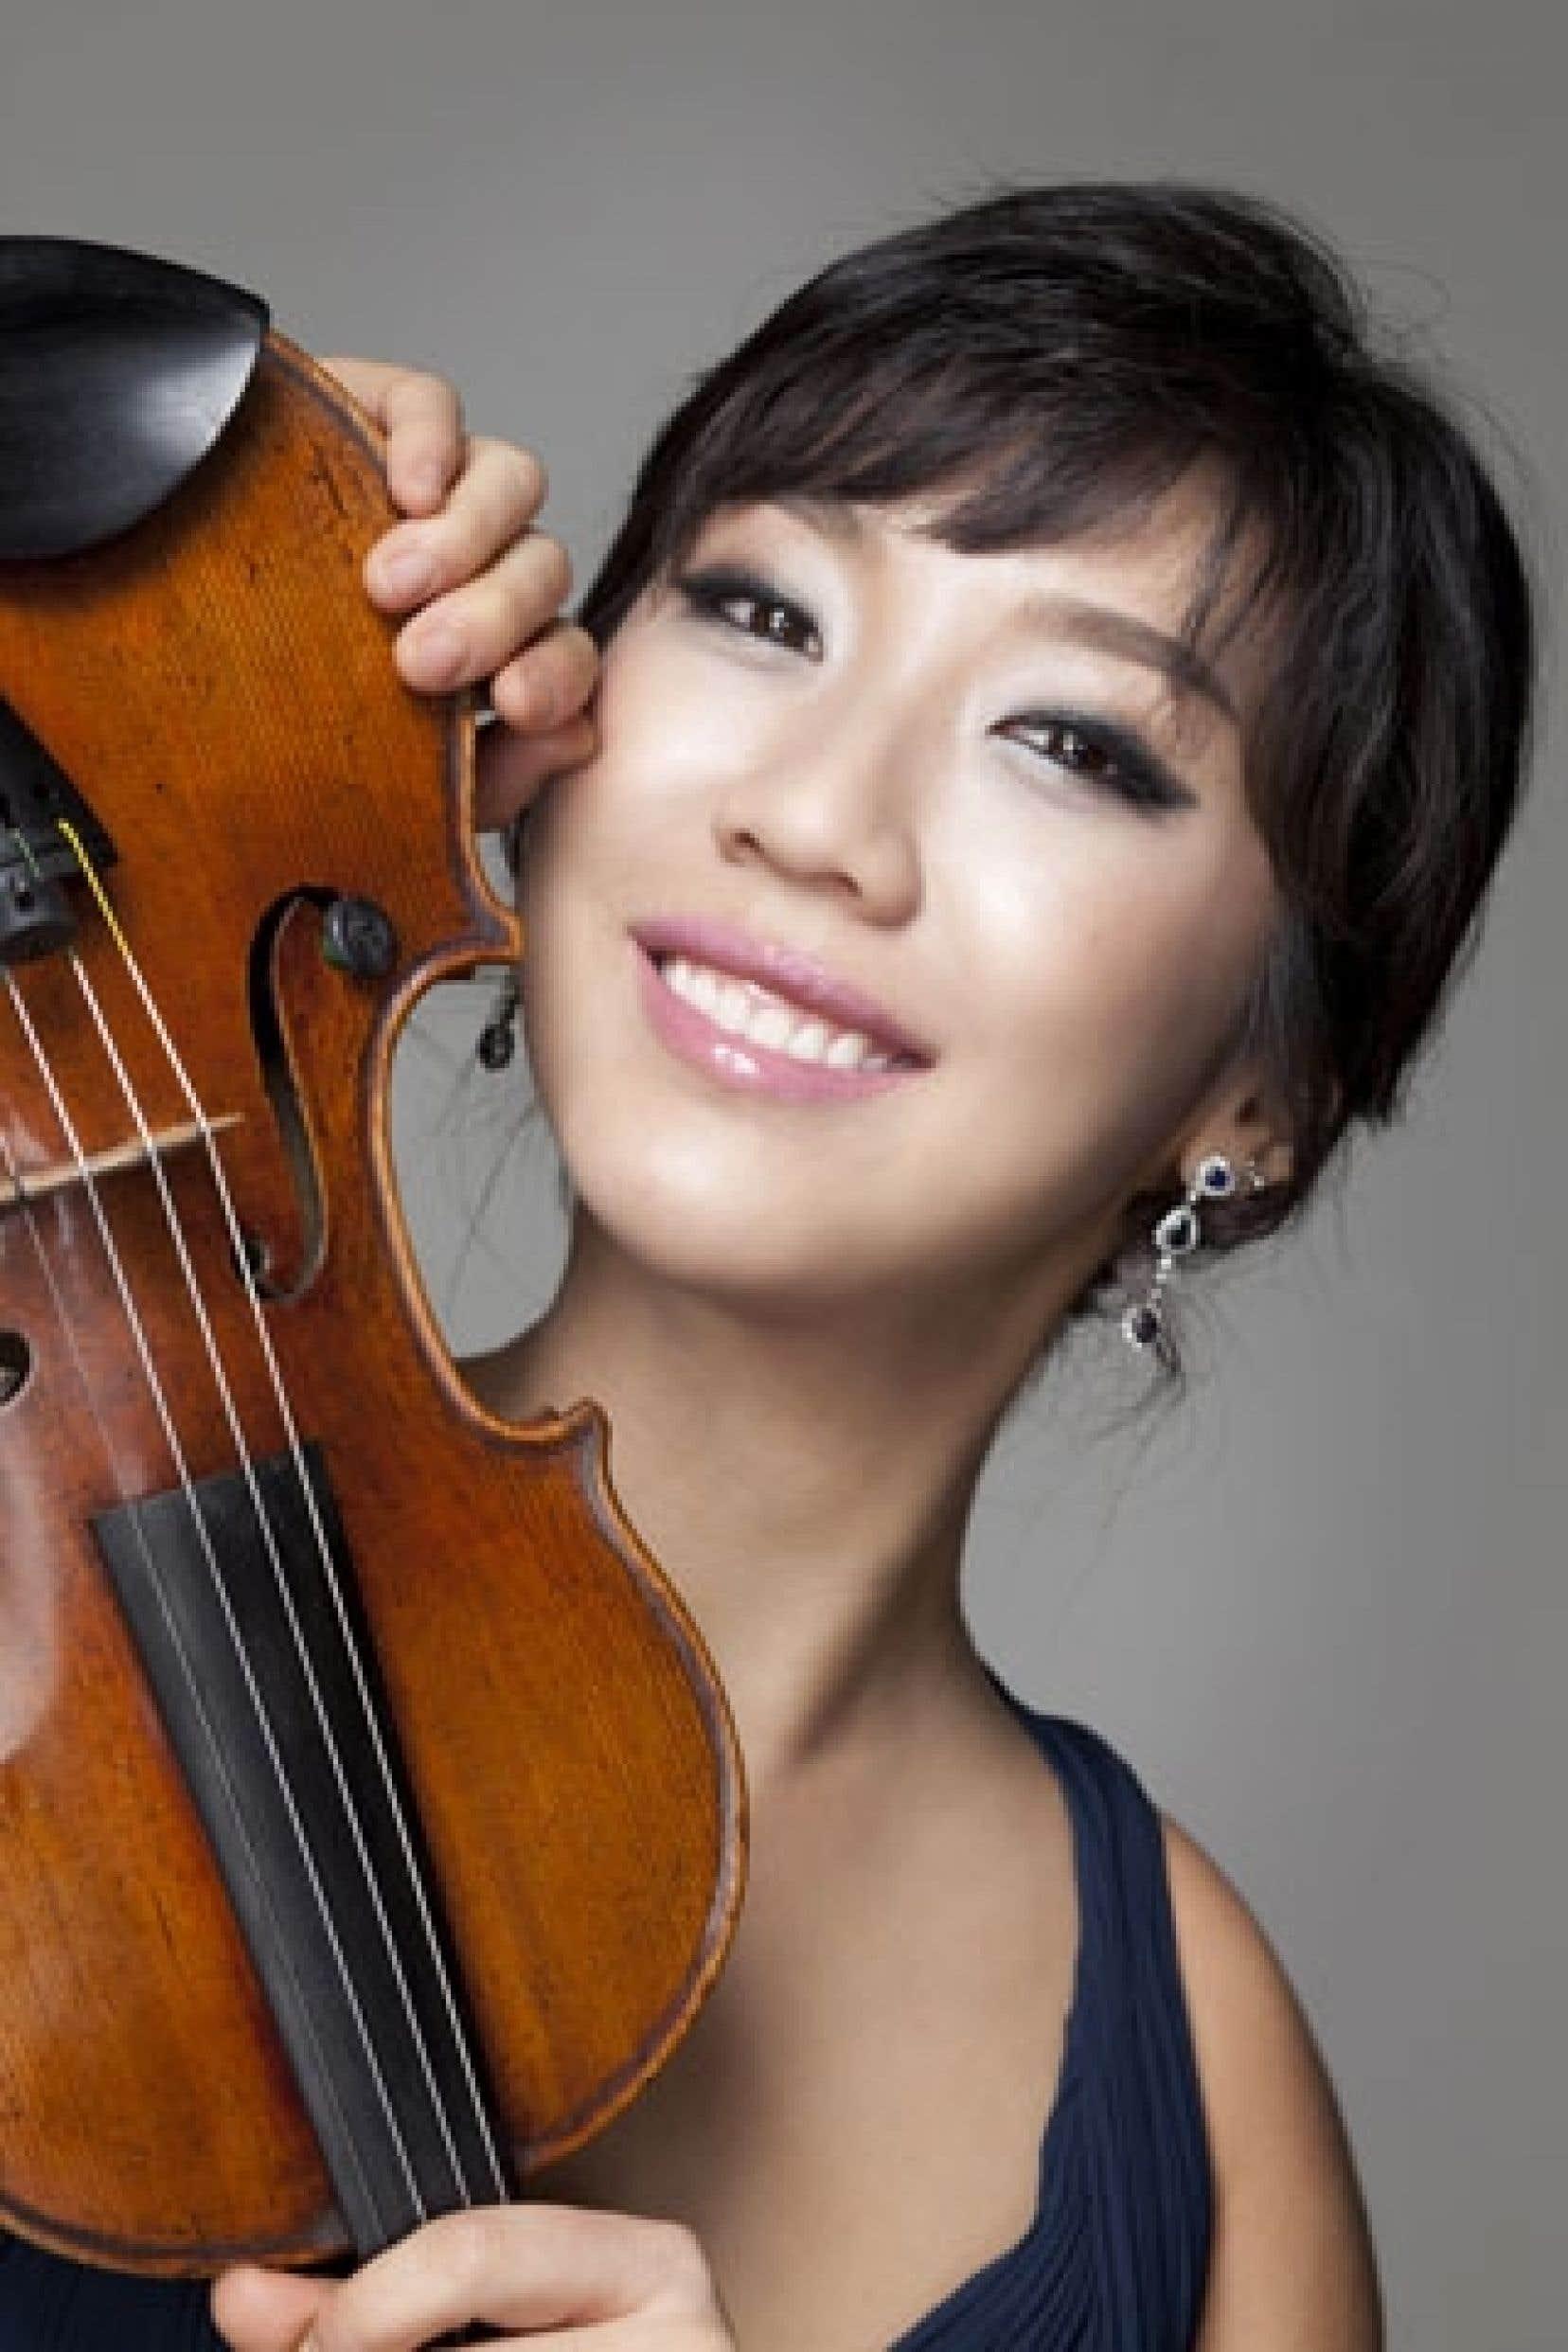 L'Américaine Fabiola Kim